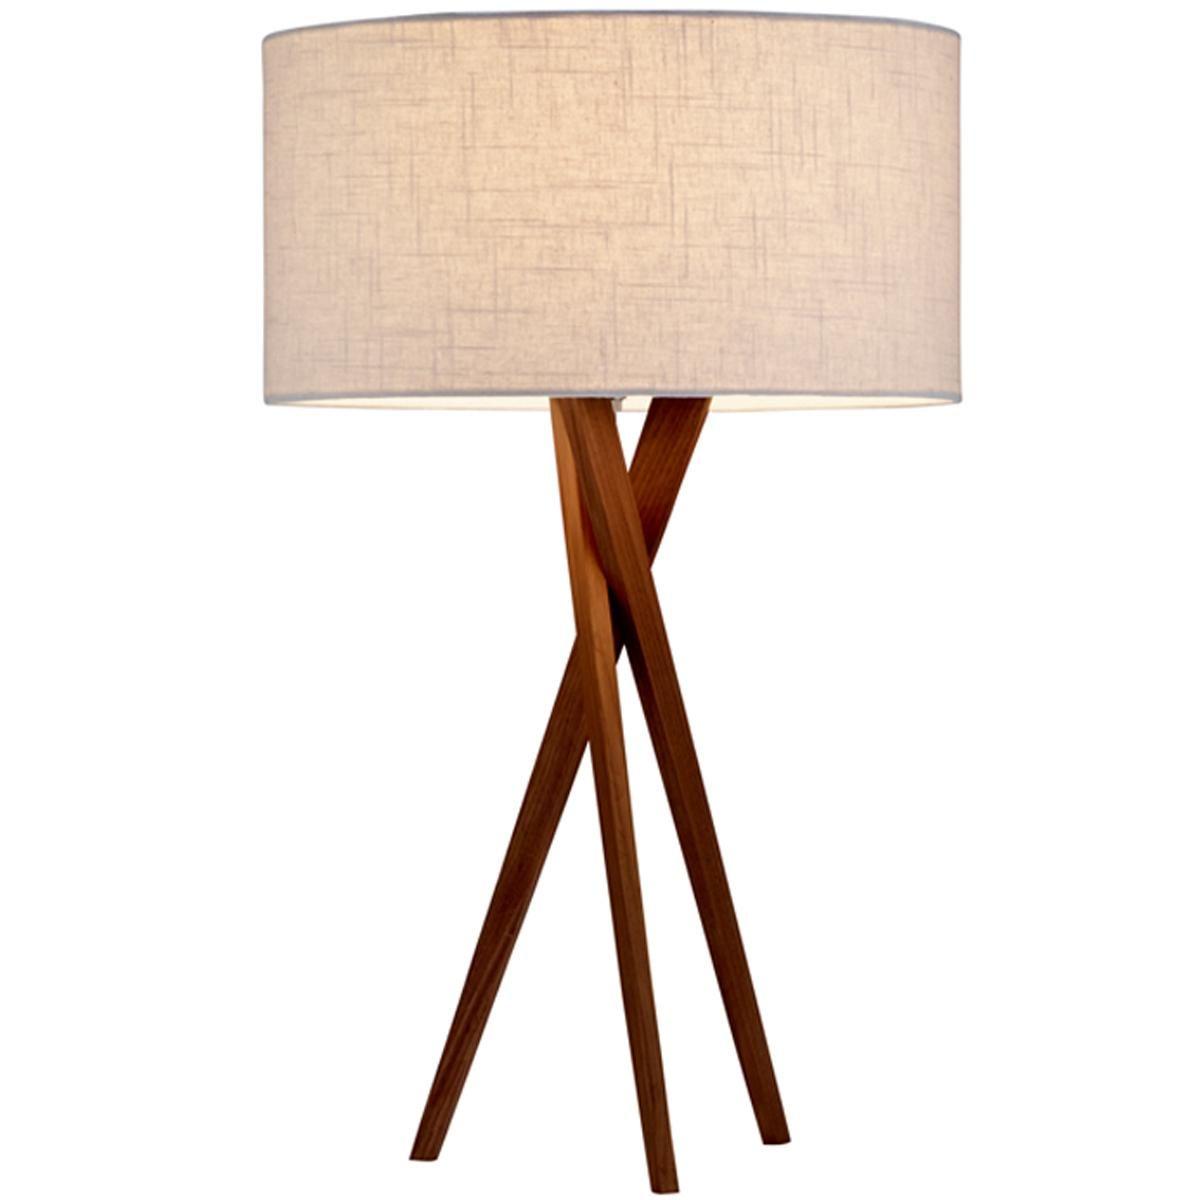 Sleek Wood Modern Tripod Table Lamp Shades Of Light